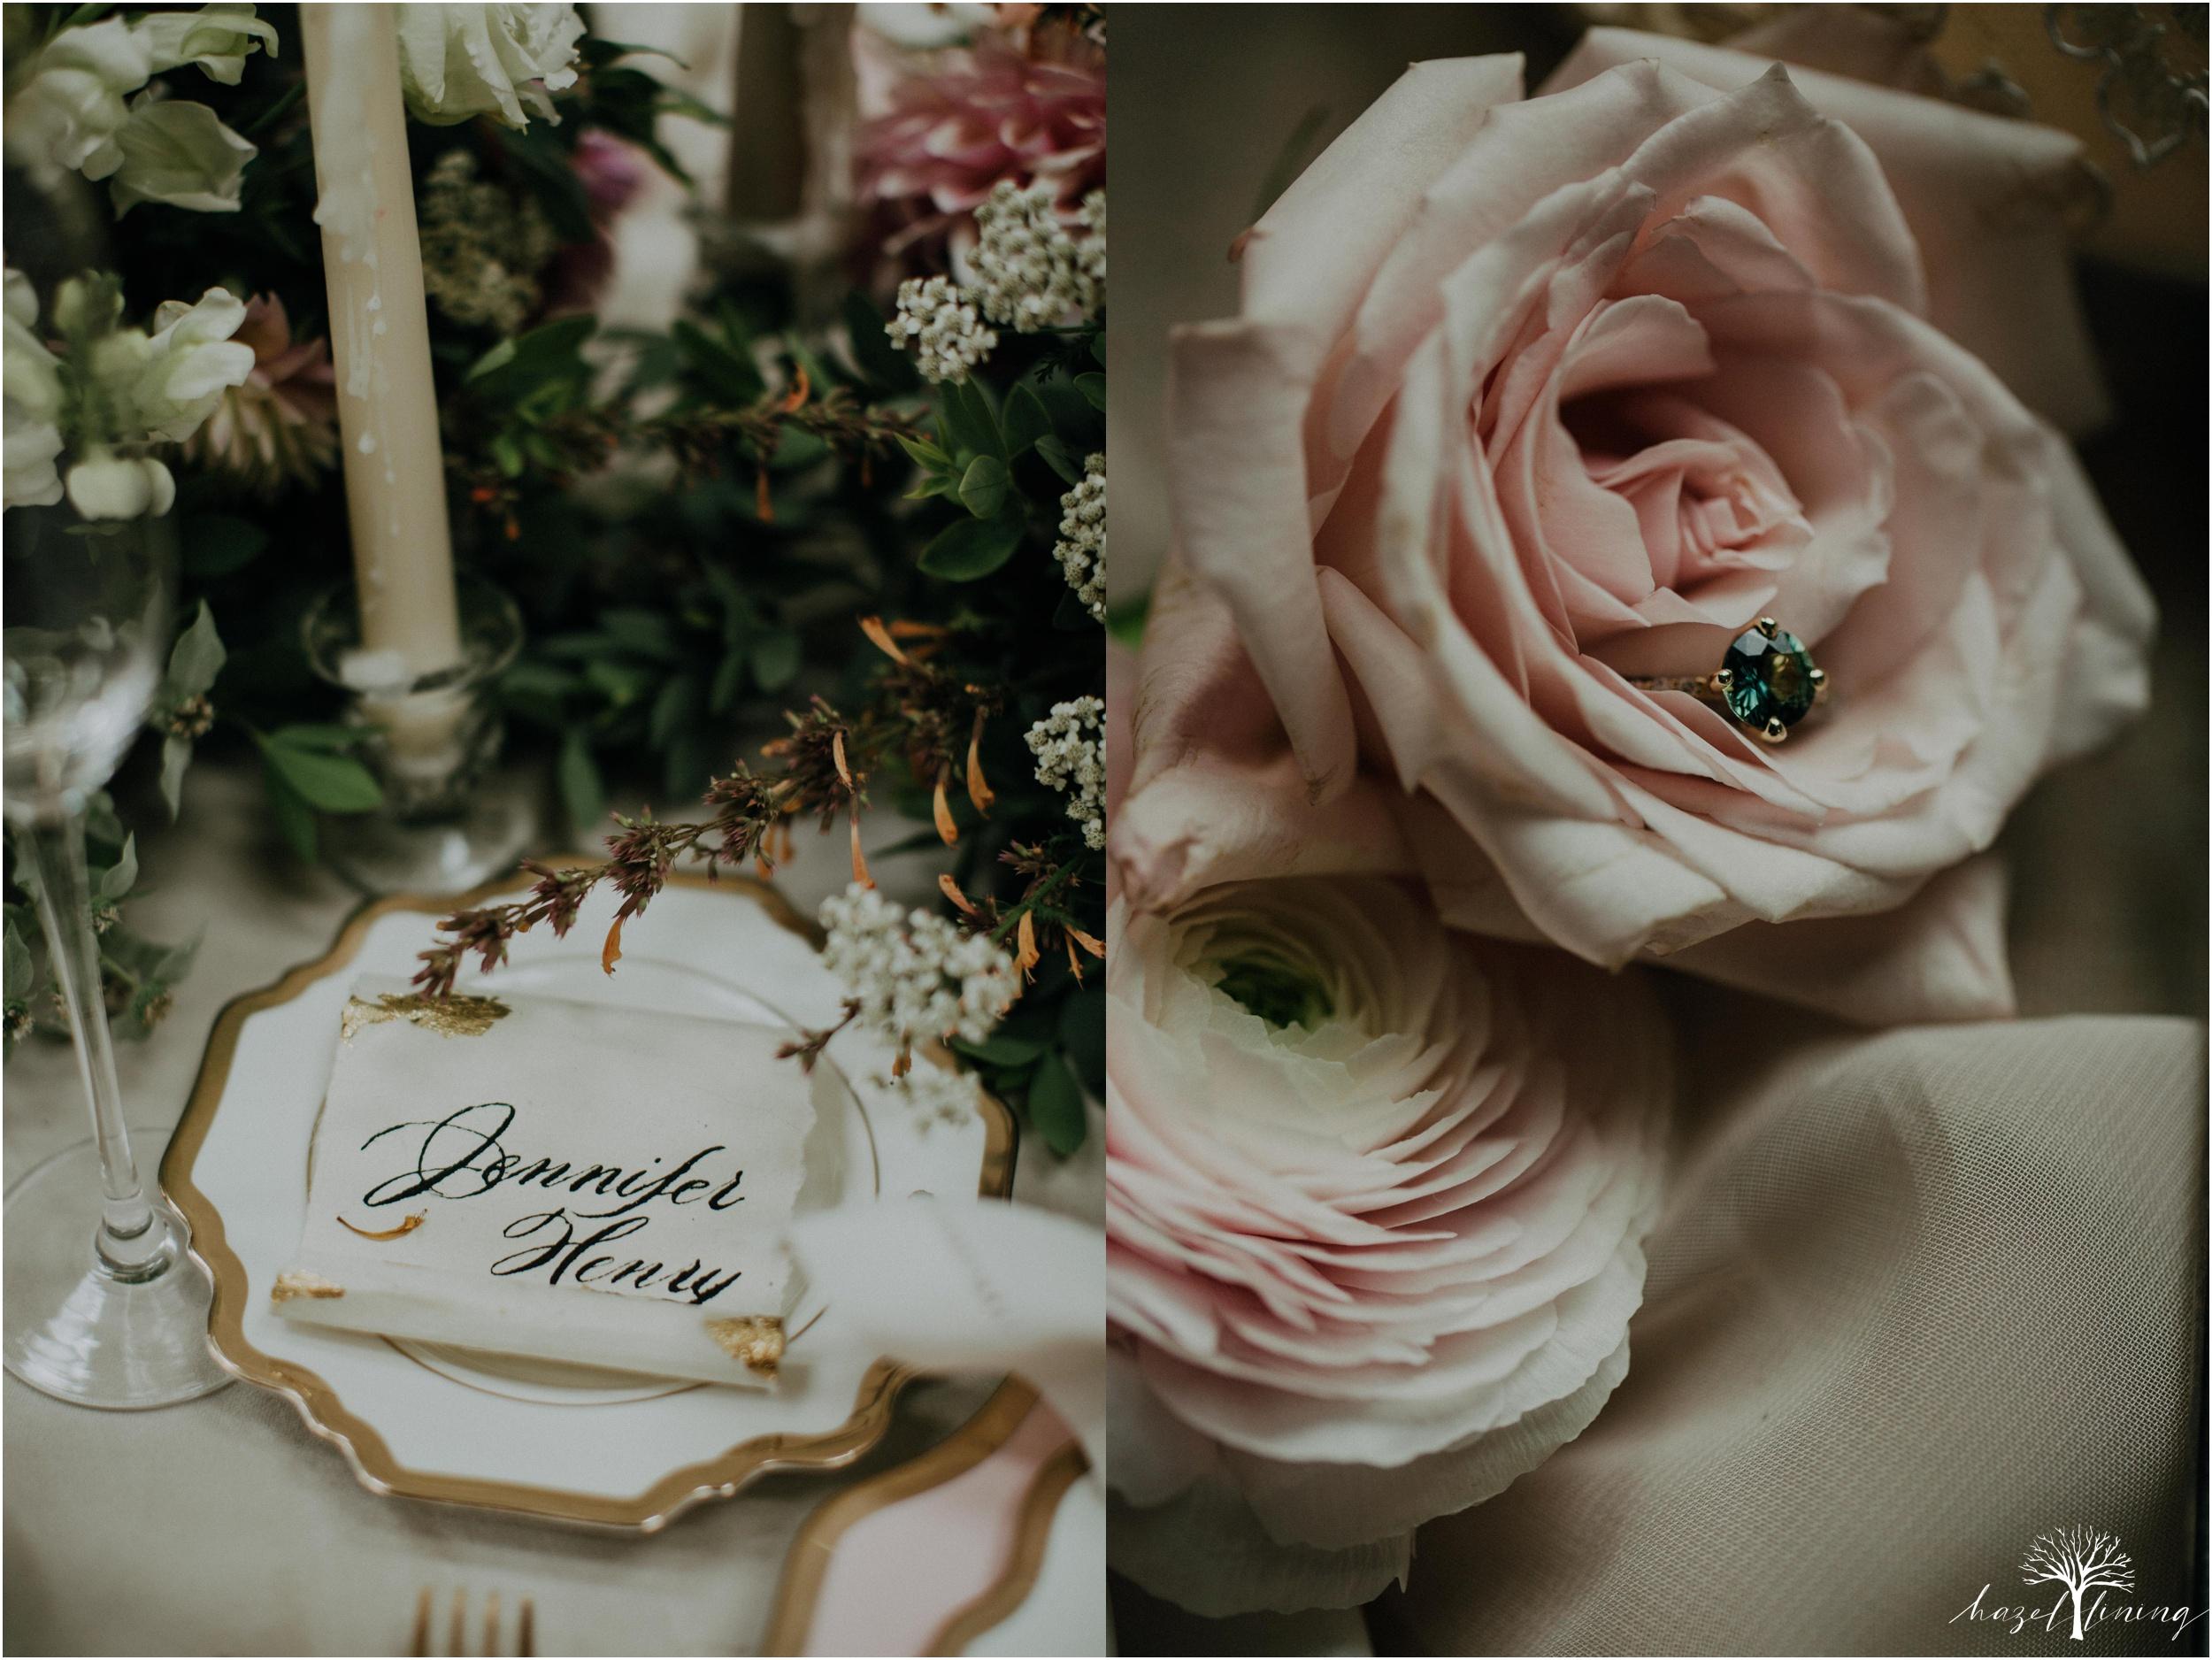 carl-chloe-the-ryland-inn-whitehouse-station-new-jersey-styled-squad-hazel-lining-photography-destination-elopement-wedding-engagement-photography_0011.jpg